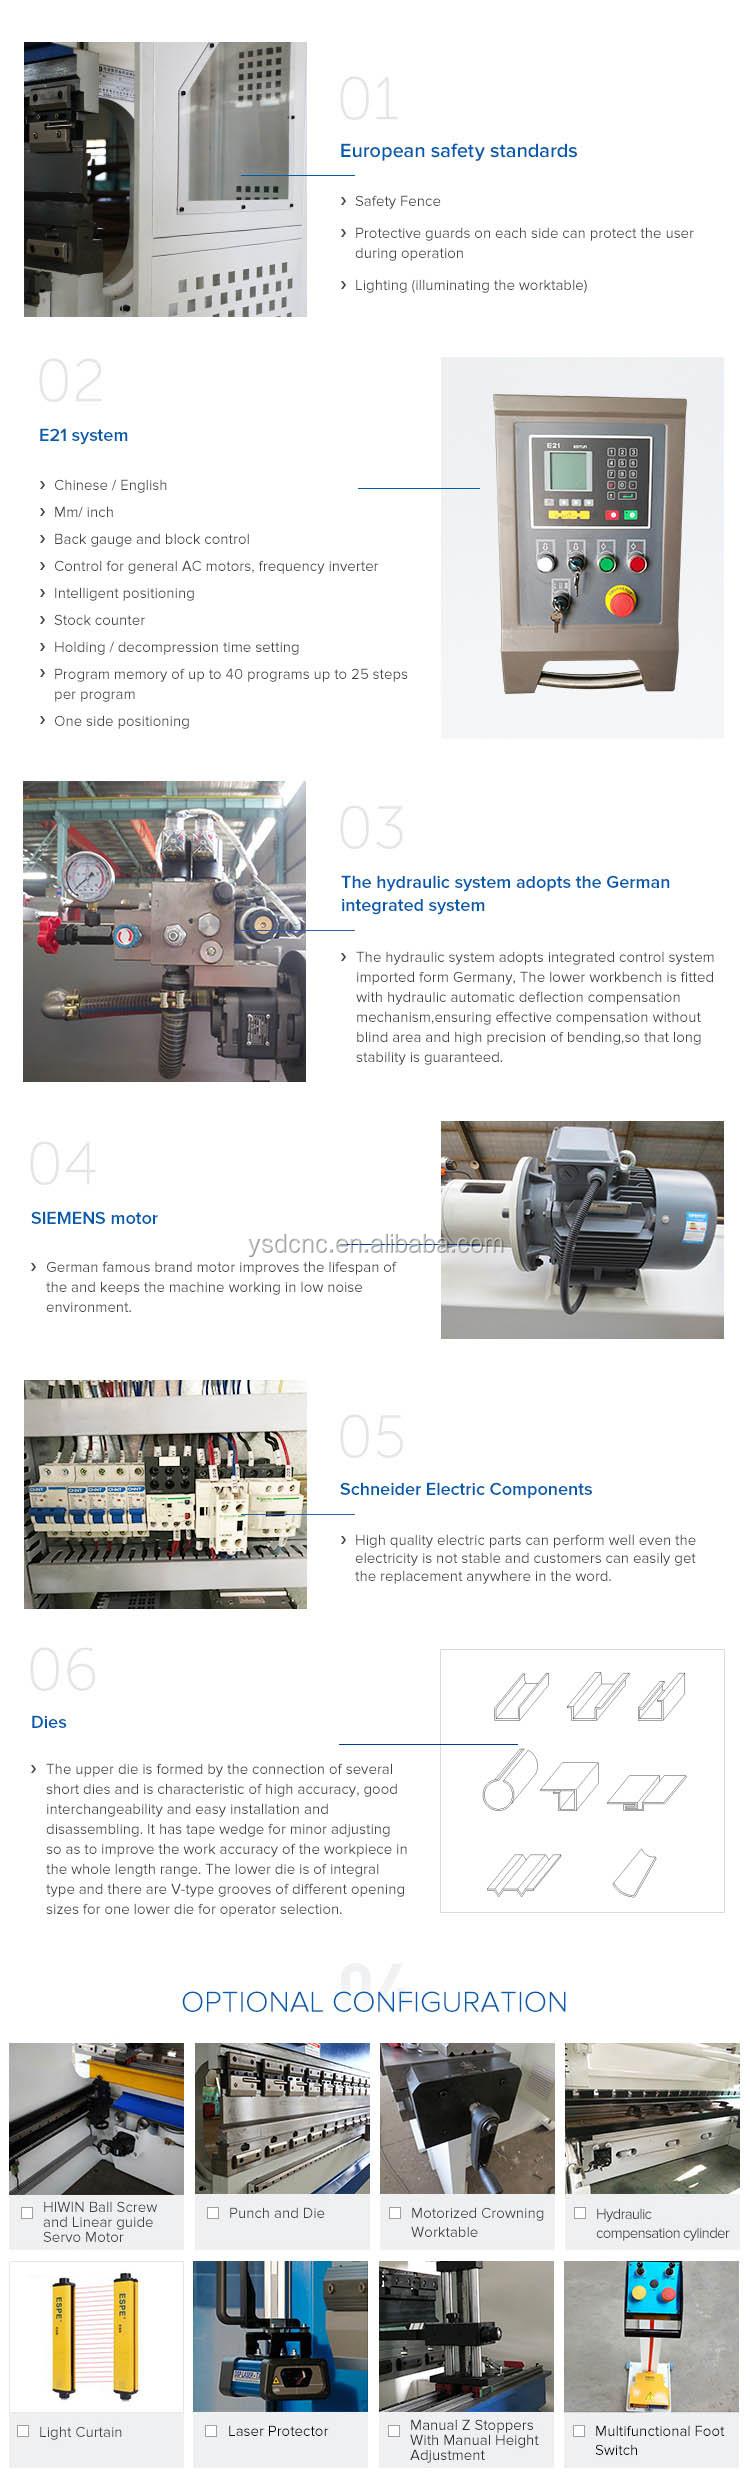 WC67K-125T/4000 Ysdcnc โลหะไฟฟ้าส่วนประกอบไฮดรอลิก NC แผ่นโลหะ bender พร้อม DA56, DA65W